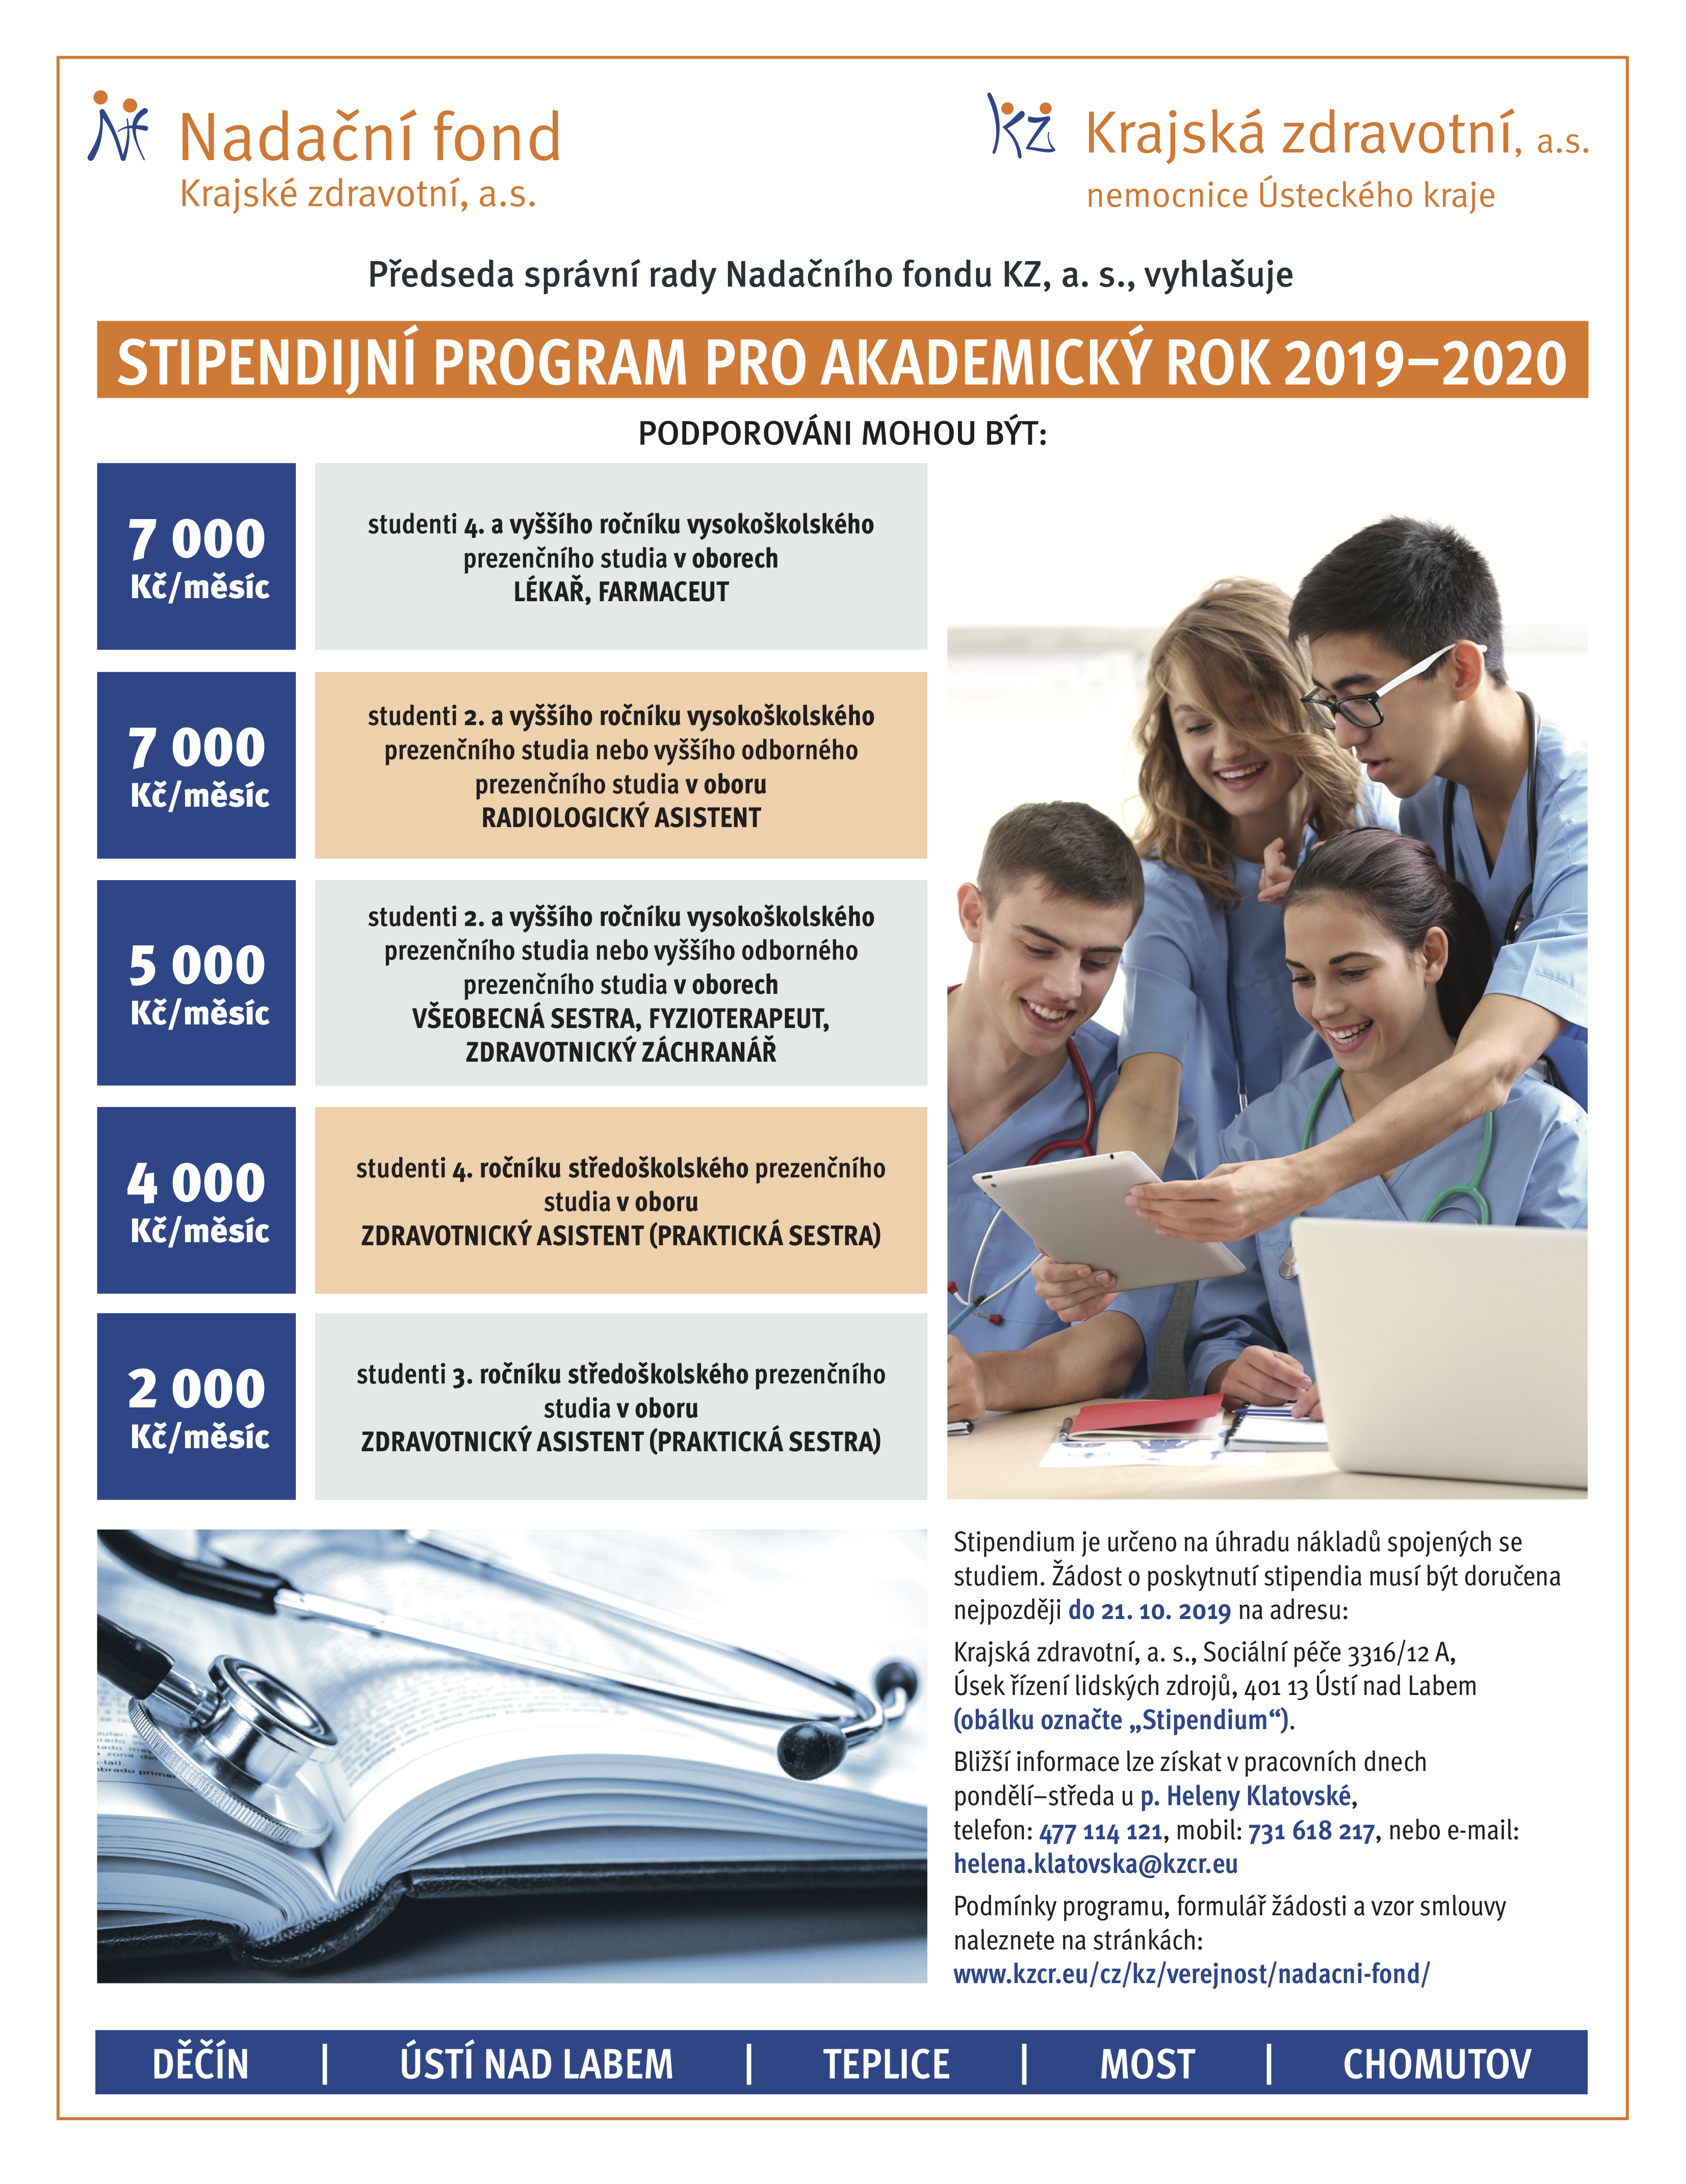 2019-2020 Nadacni fond